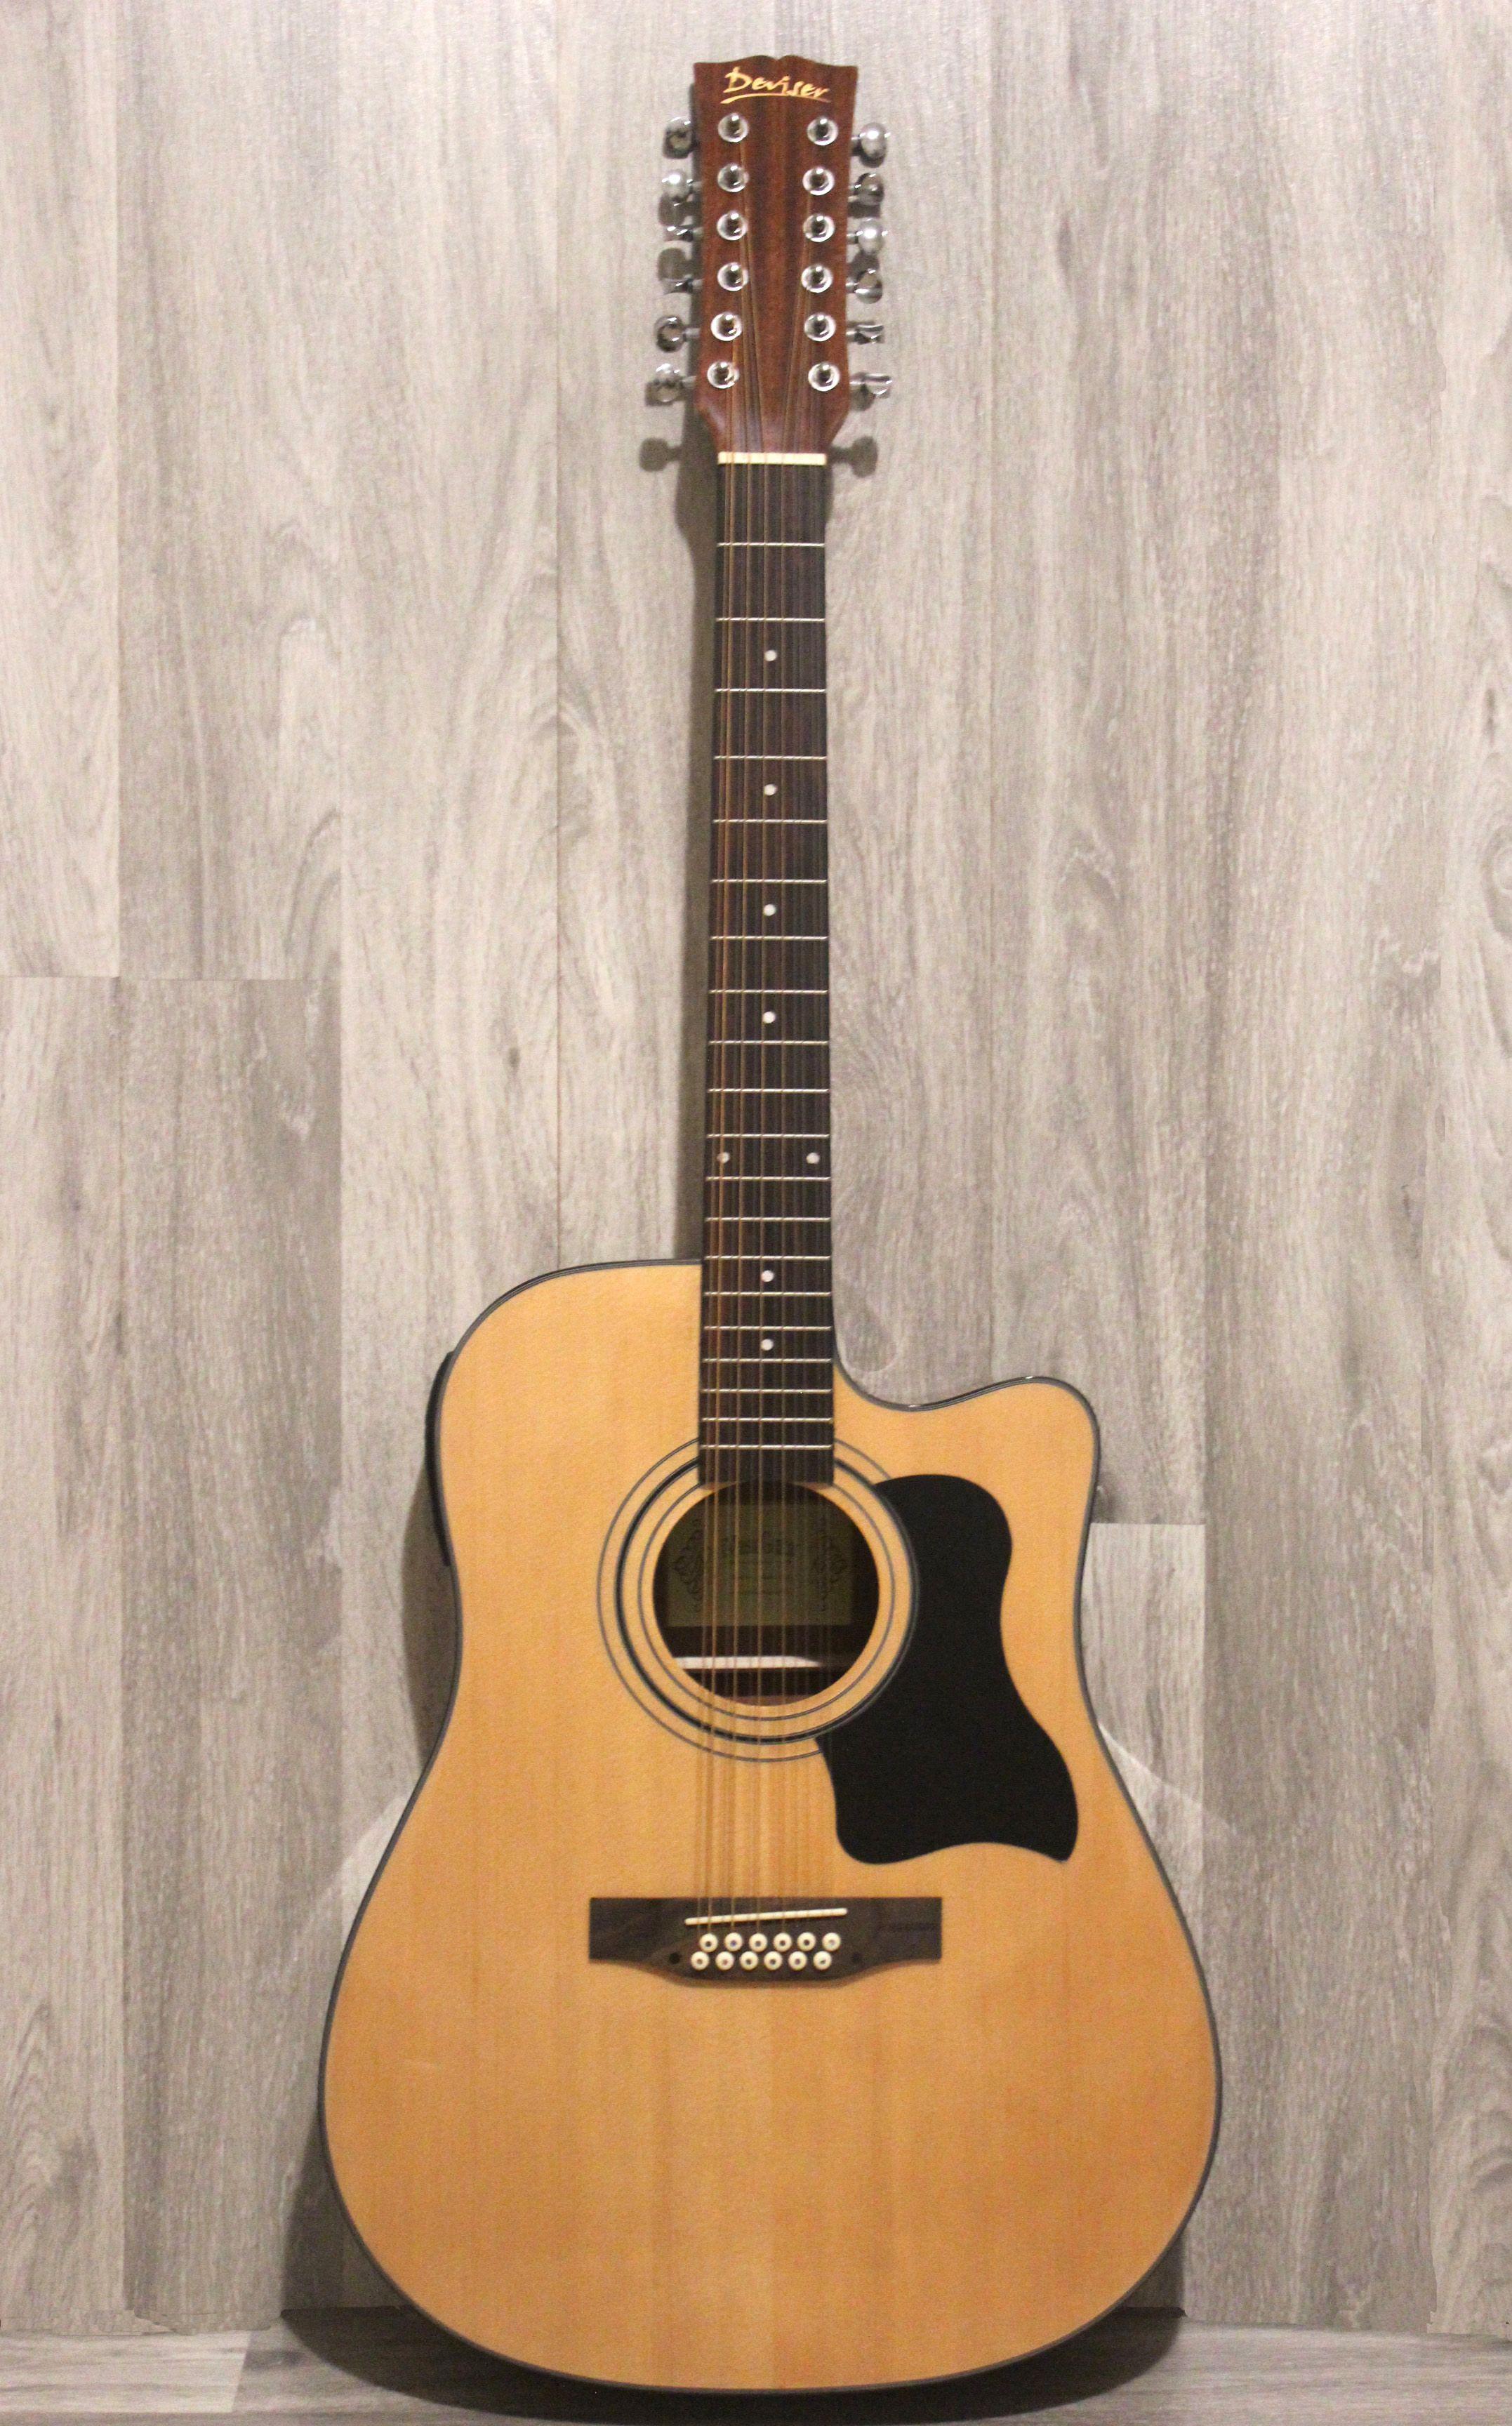 Acoustic Guitar 12 Strings Built In Tuner Eq Natural Imusic12eq Guitar Acoustic Guitar Guitar Tuners